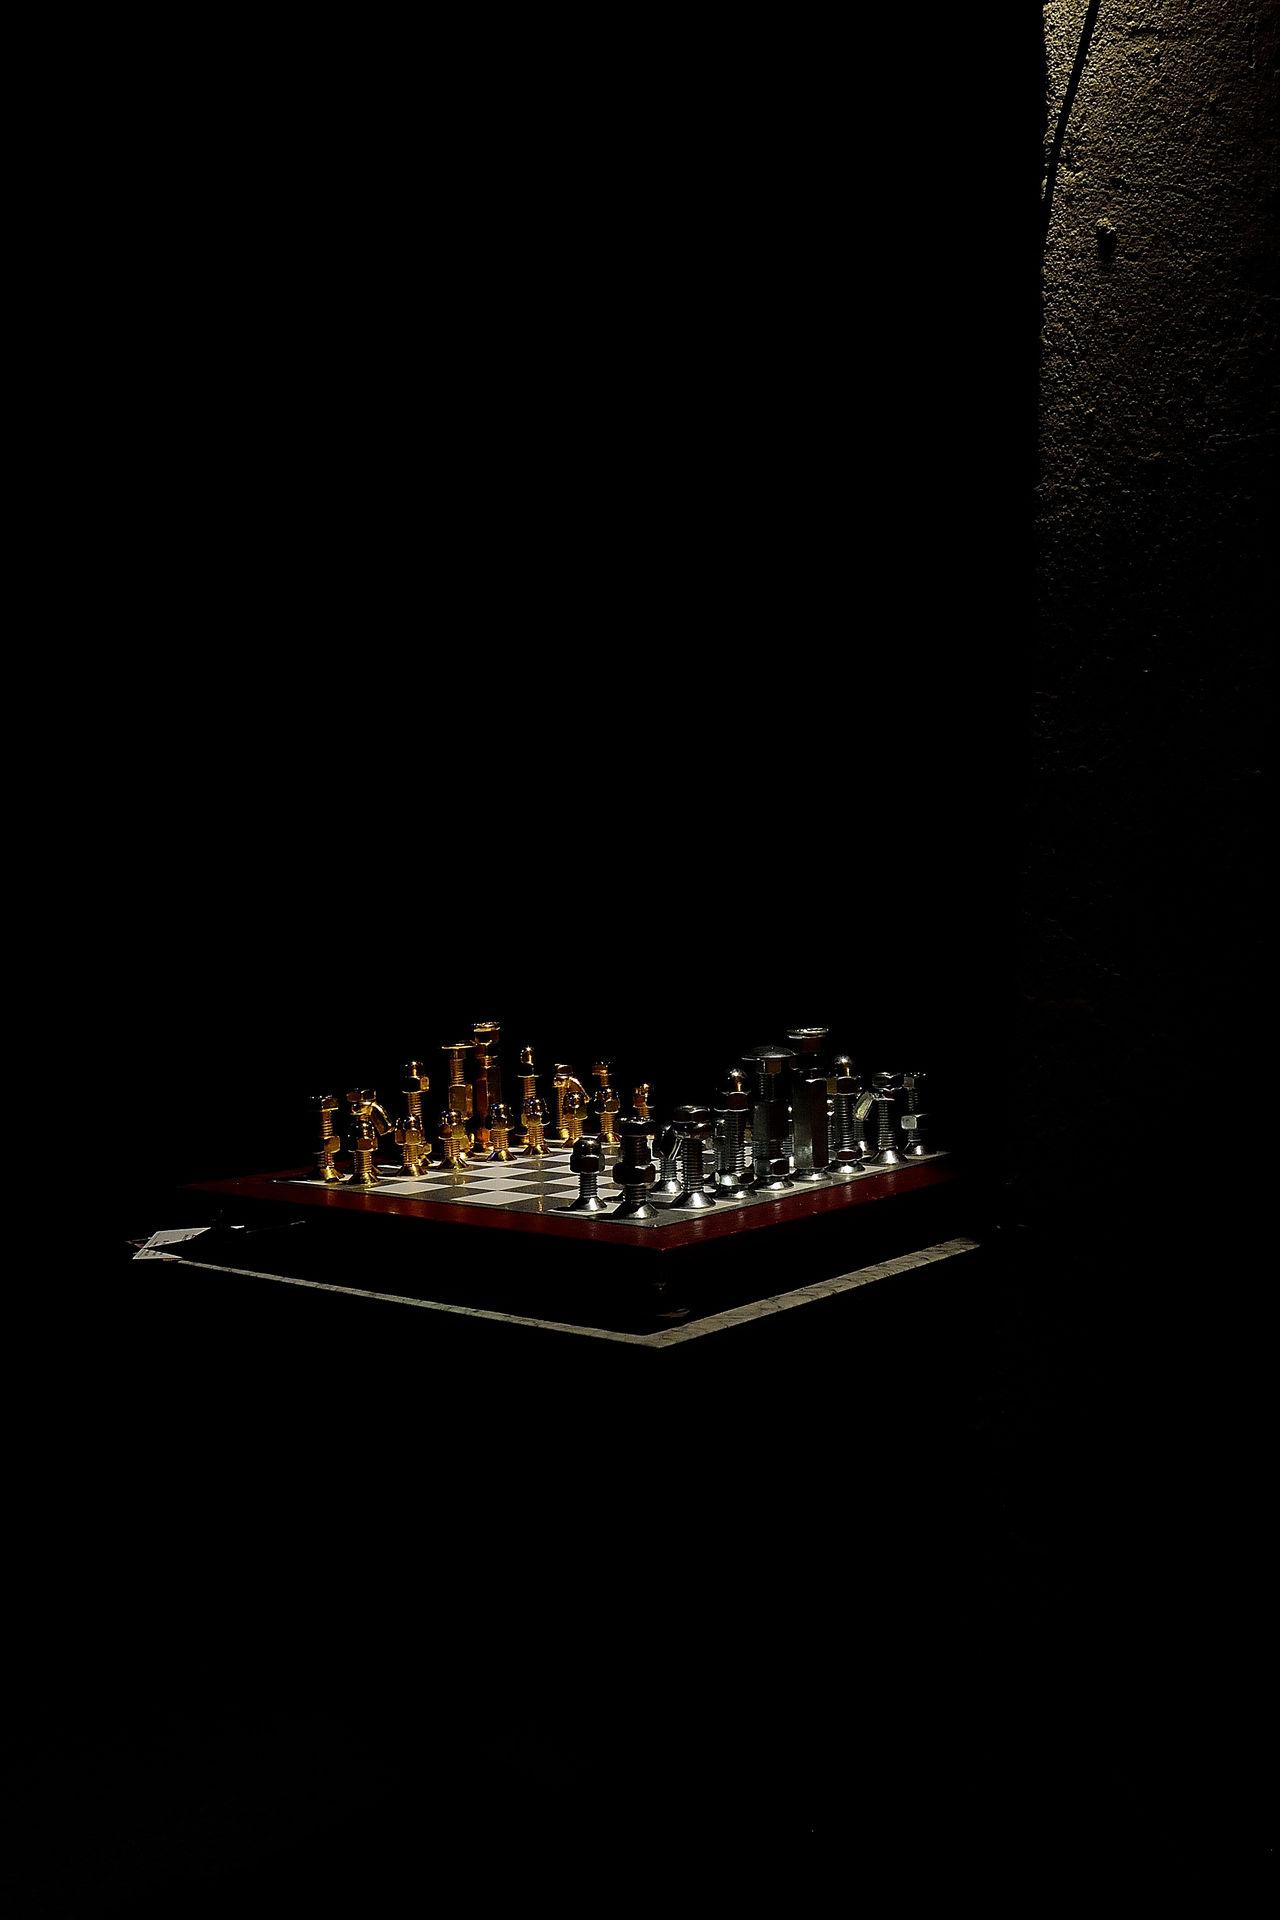 Black Background Bulloni Casentino Close-up Dadi Day Ferramenta Indoors  No People Scacchi Studio Shot Table Toscana Variation Viti